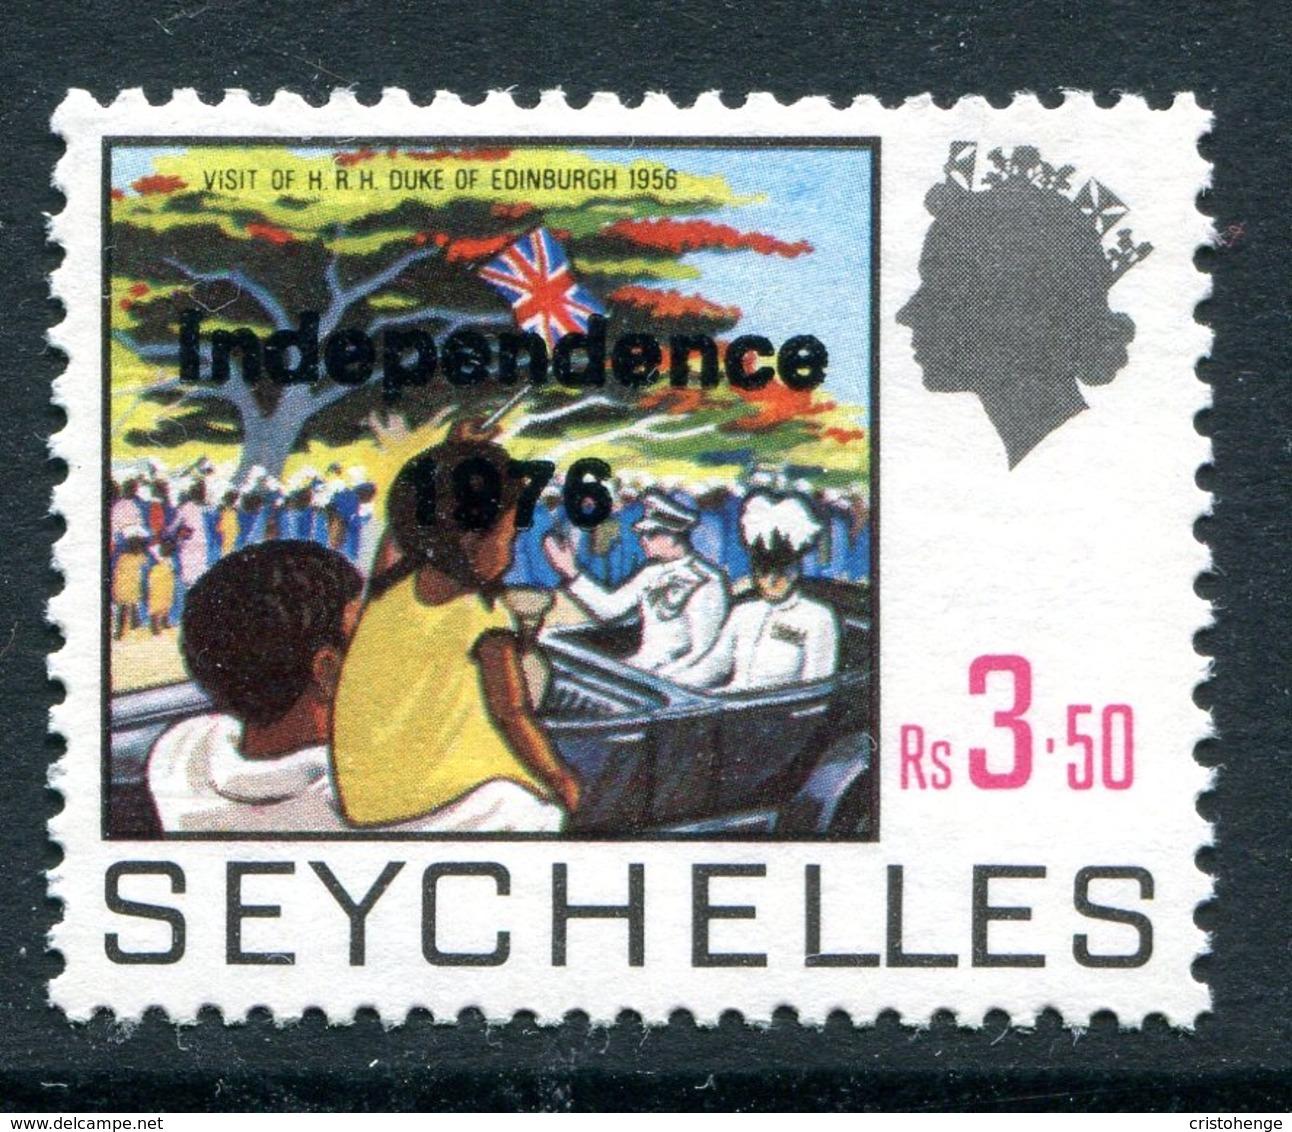 Seychelles 1976 Independence Overprint - 3r50 Visit Of Duke Of Edinburgh - Overprint On SG 276 MNH (SG 378b) - Seychelles (1976-...)